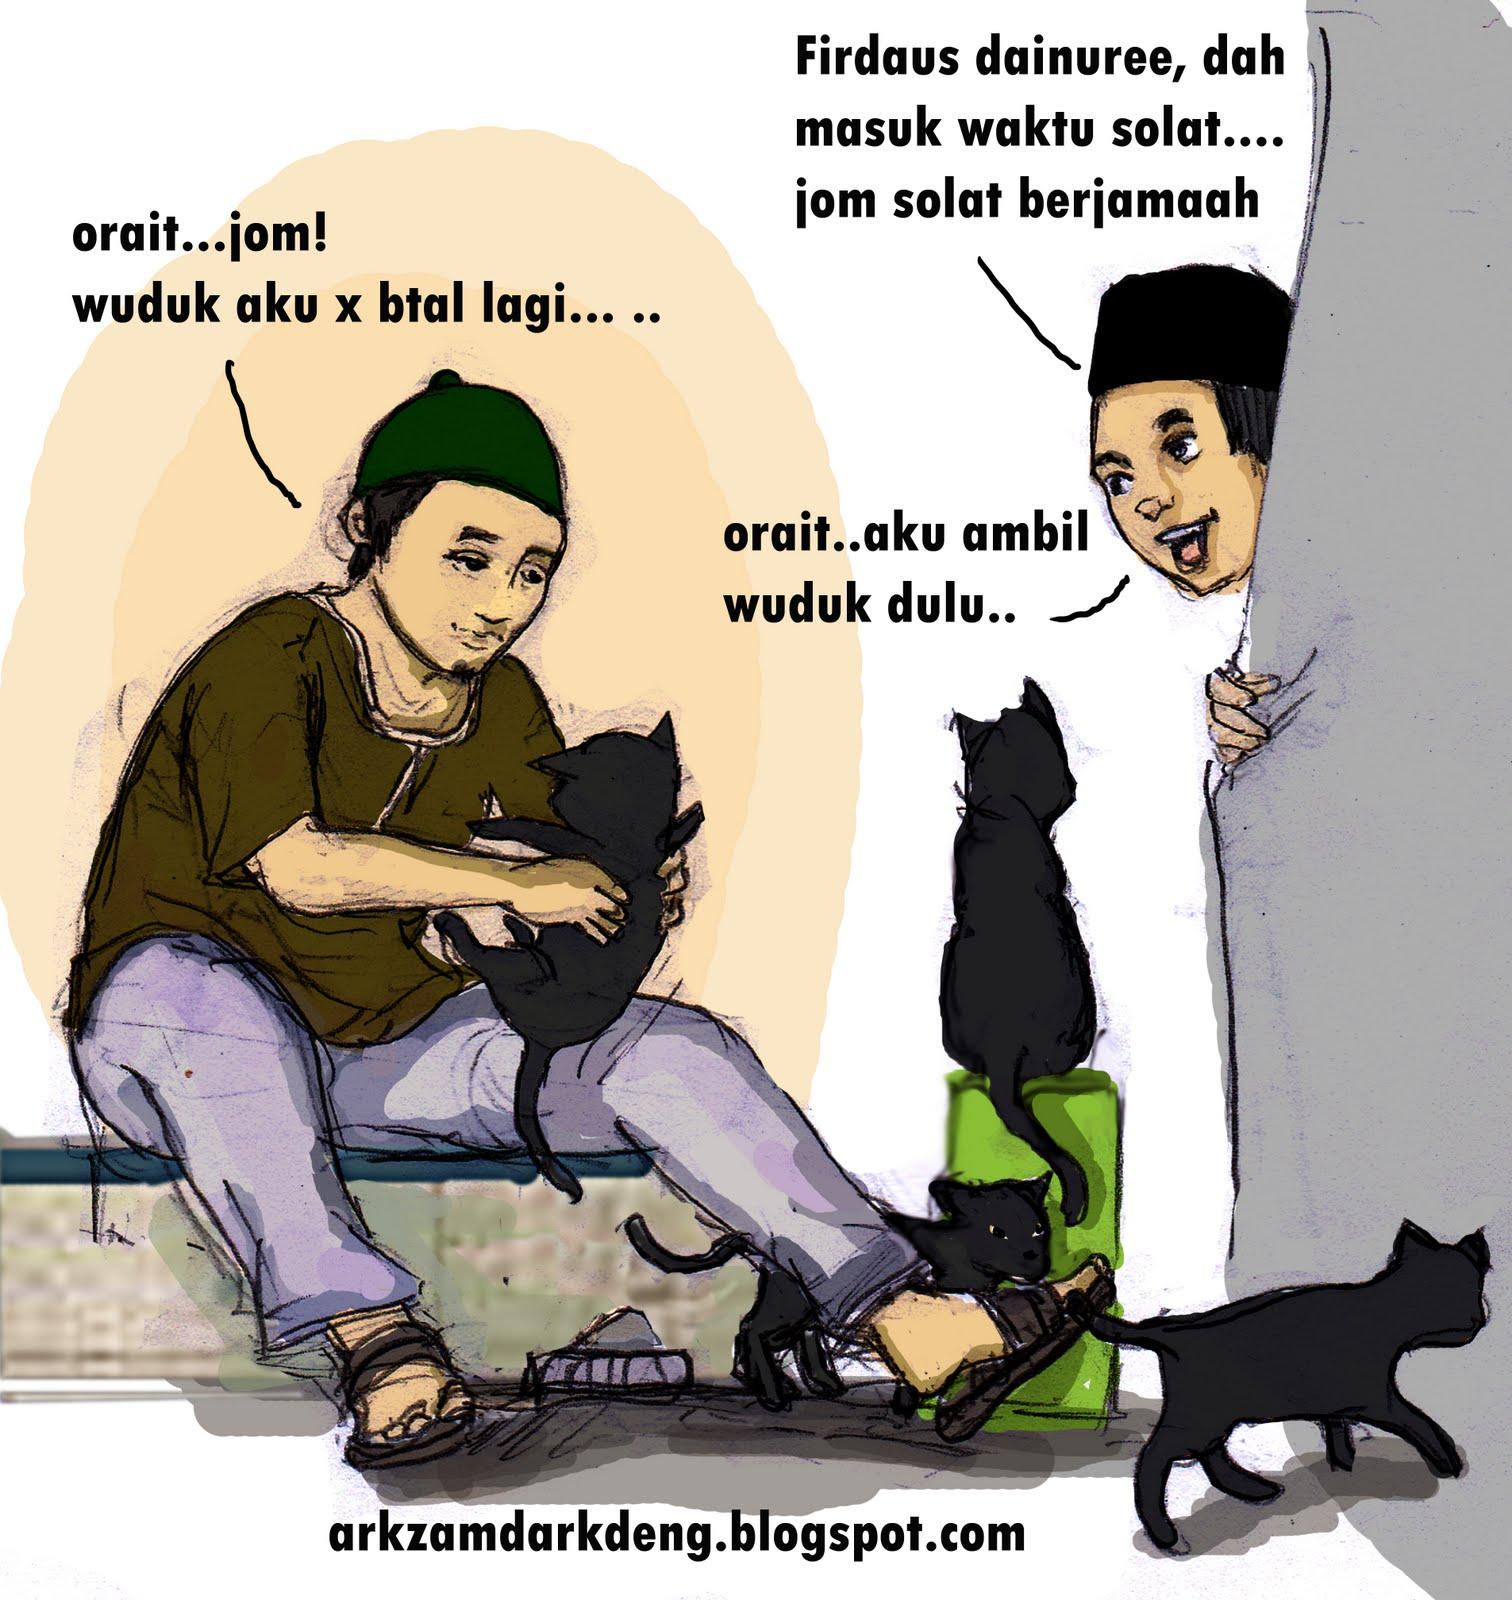 Hukum Bulu Kucing Semasa Solat Versi Kartun